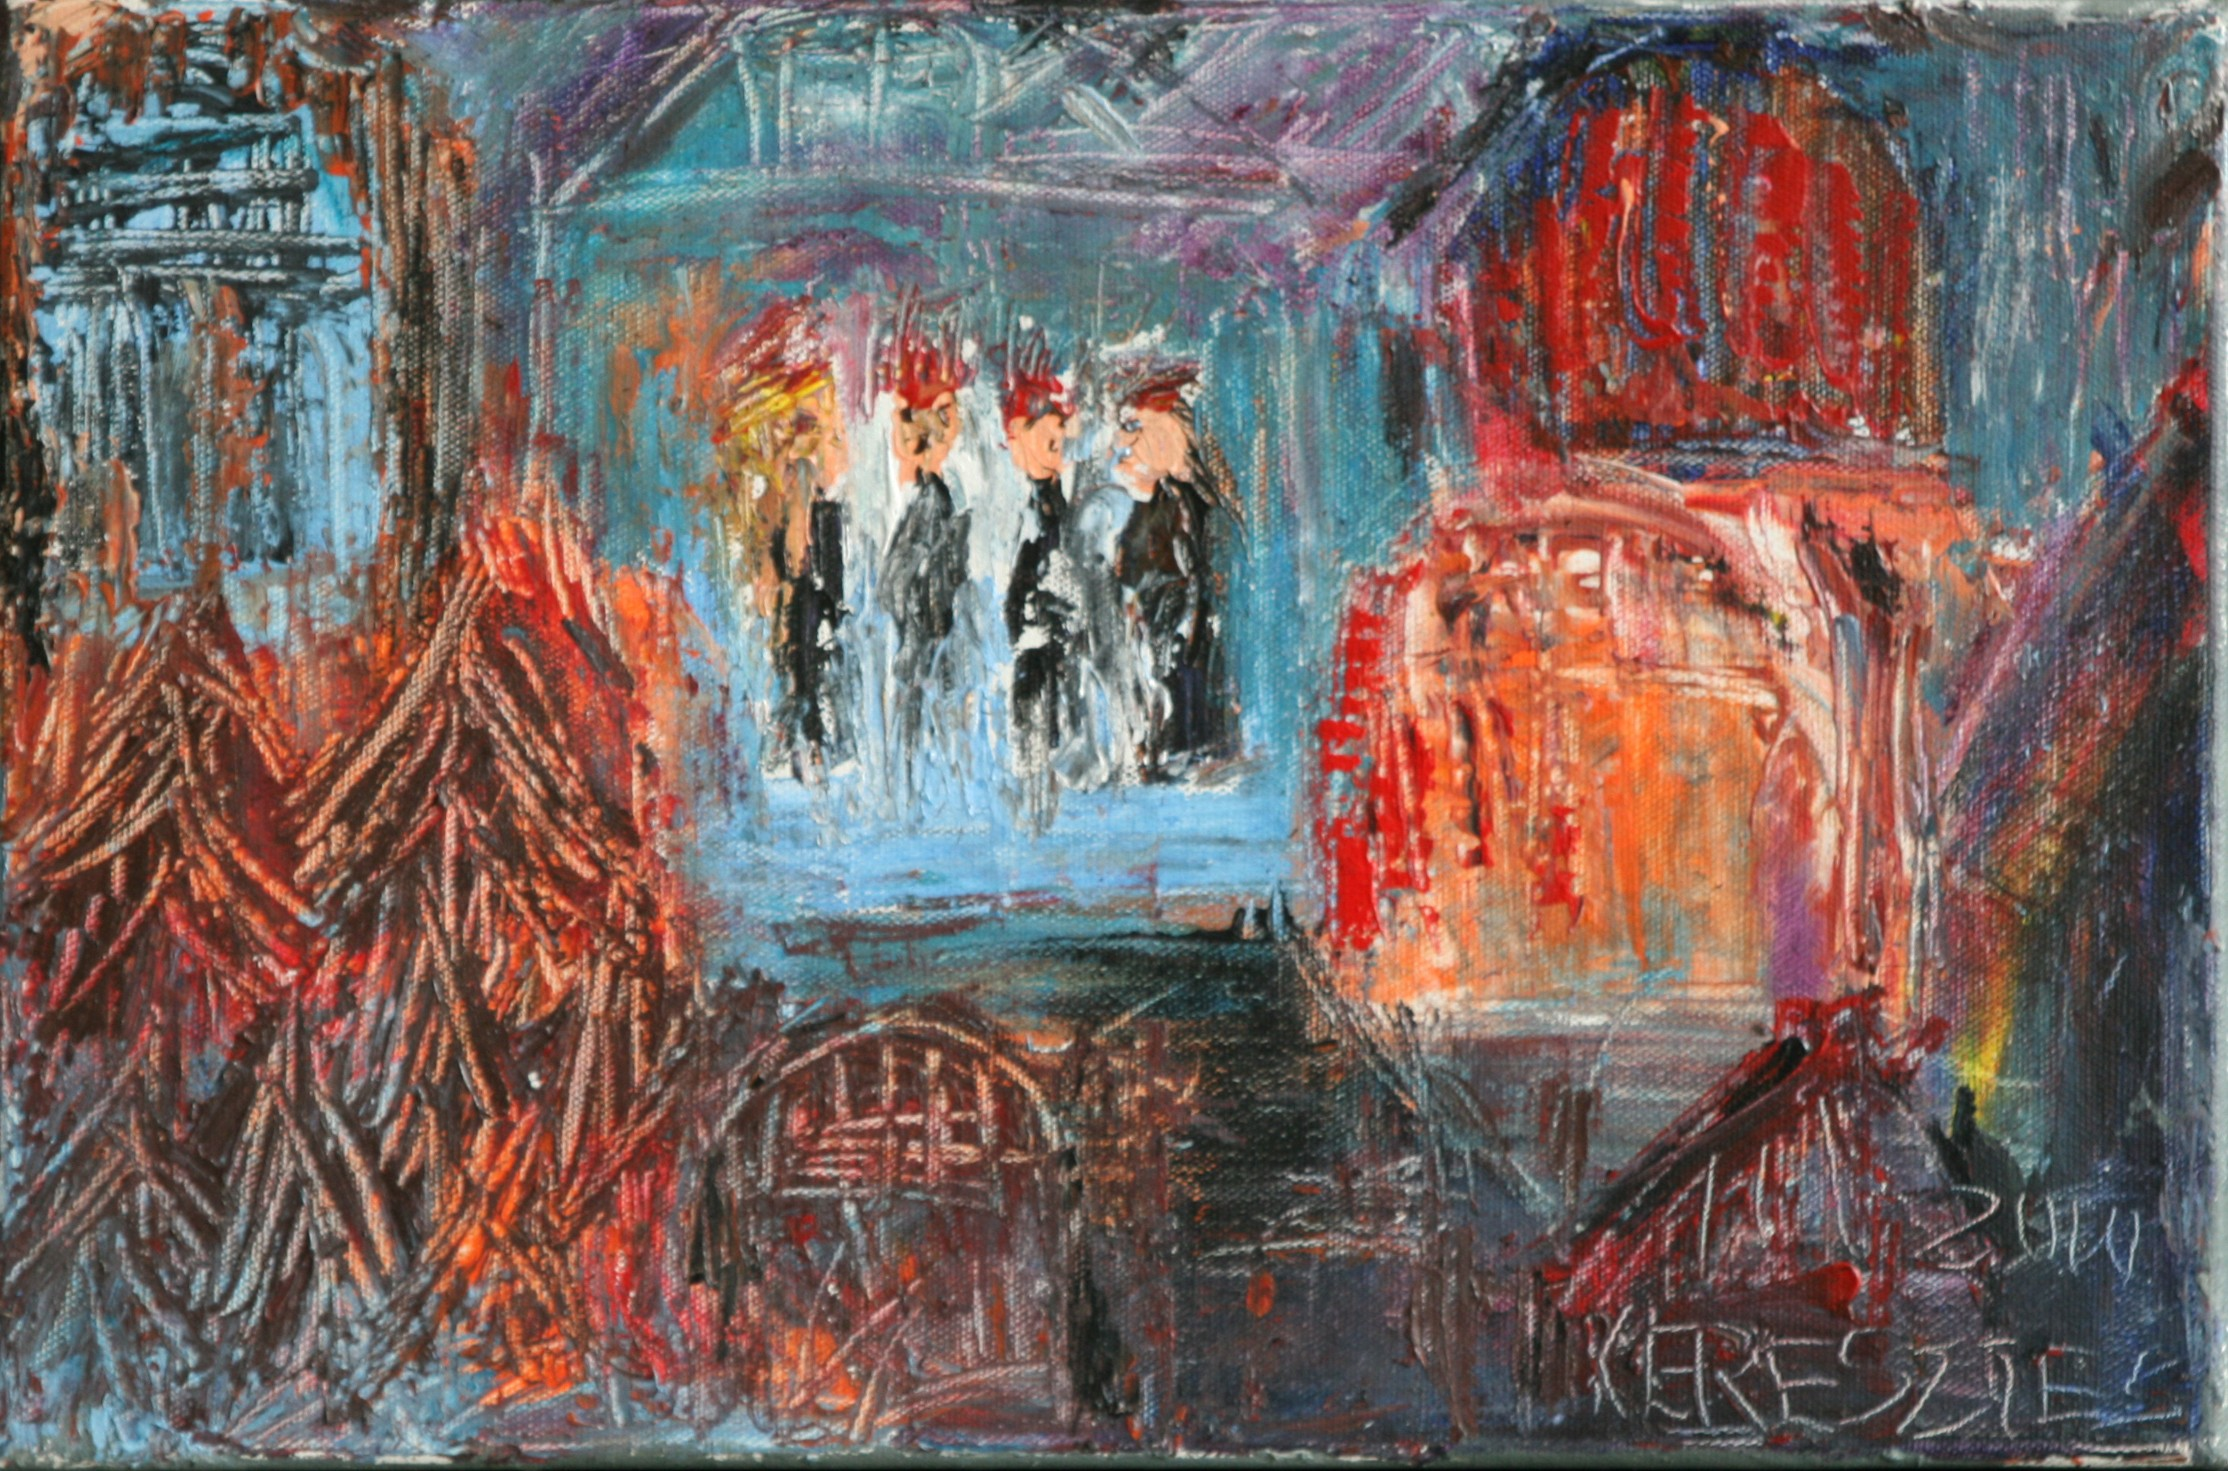 toile 10 - magdalena keresztes, artiste peintre à amiens